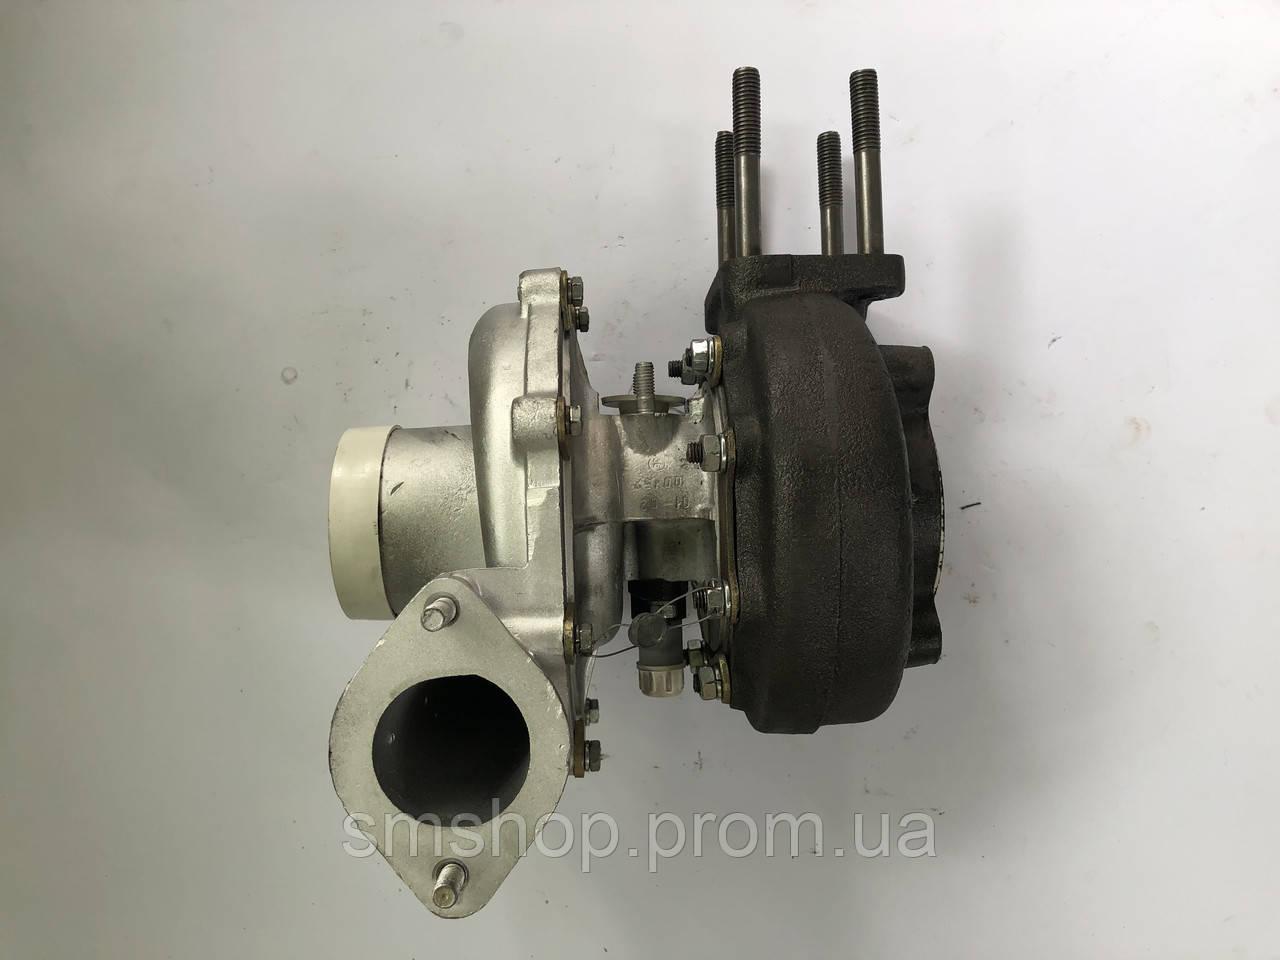 Турбокомпрессор (турбина) ТКР-8.5Н-З